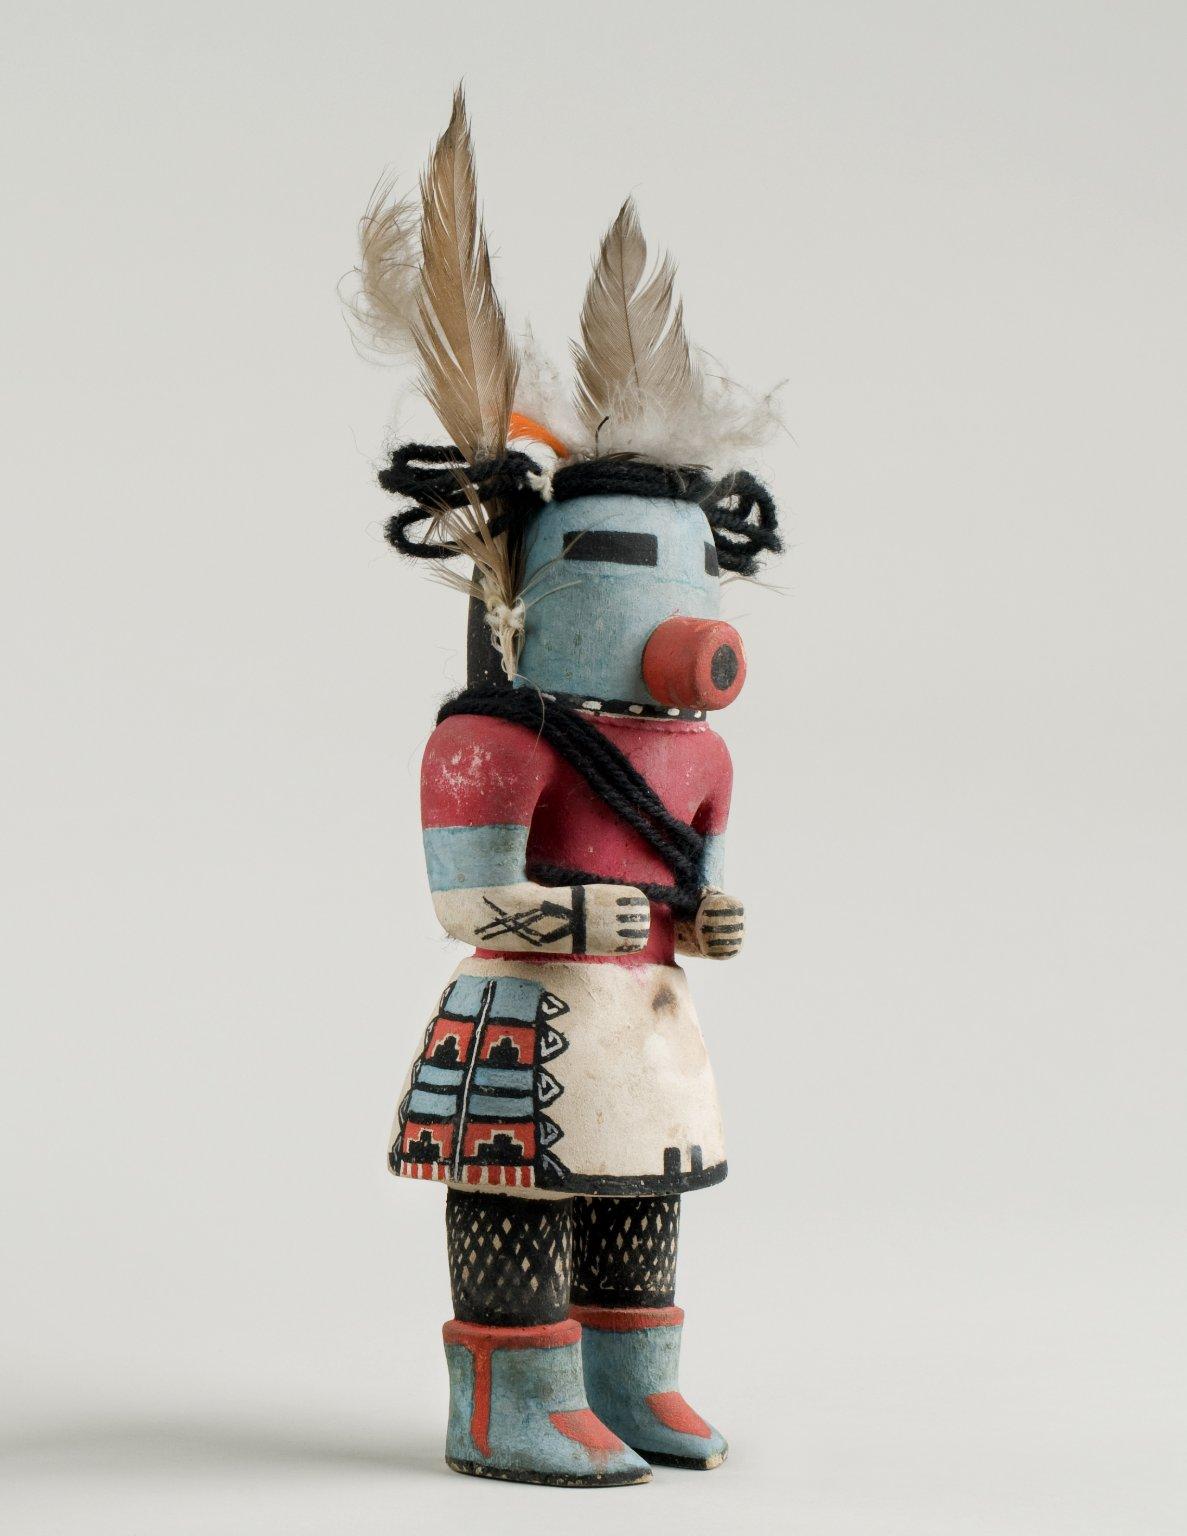 Kahaila Kachina Doll